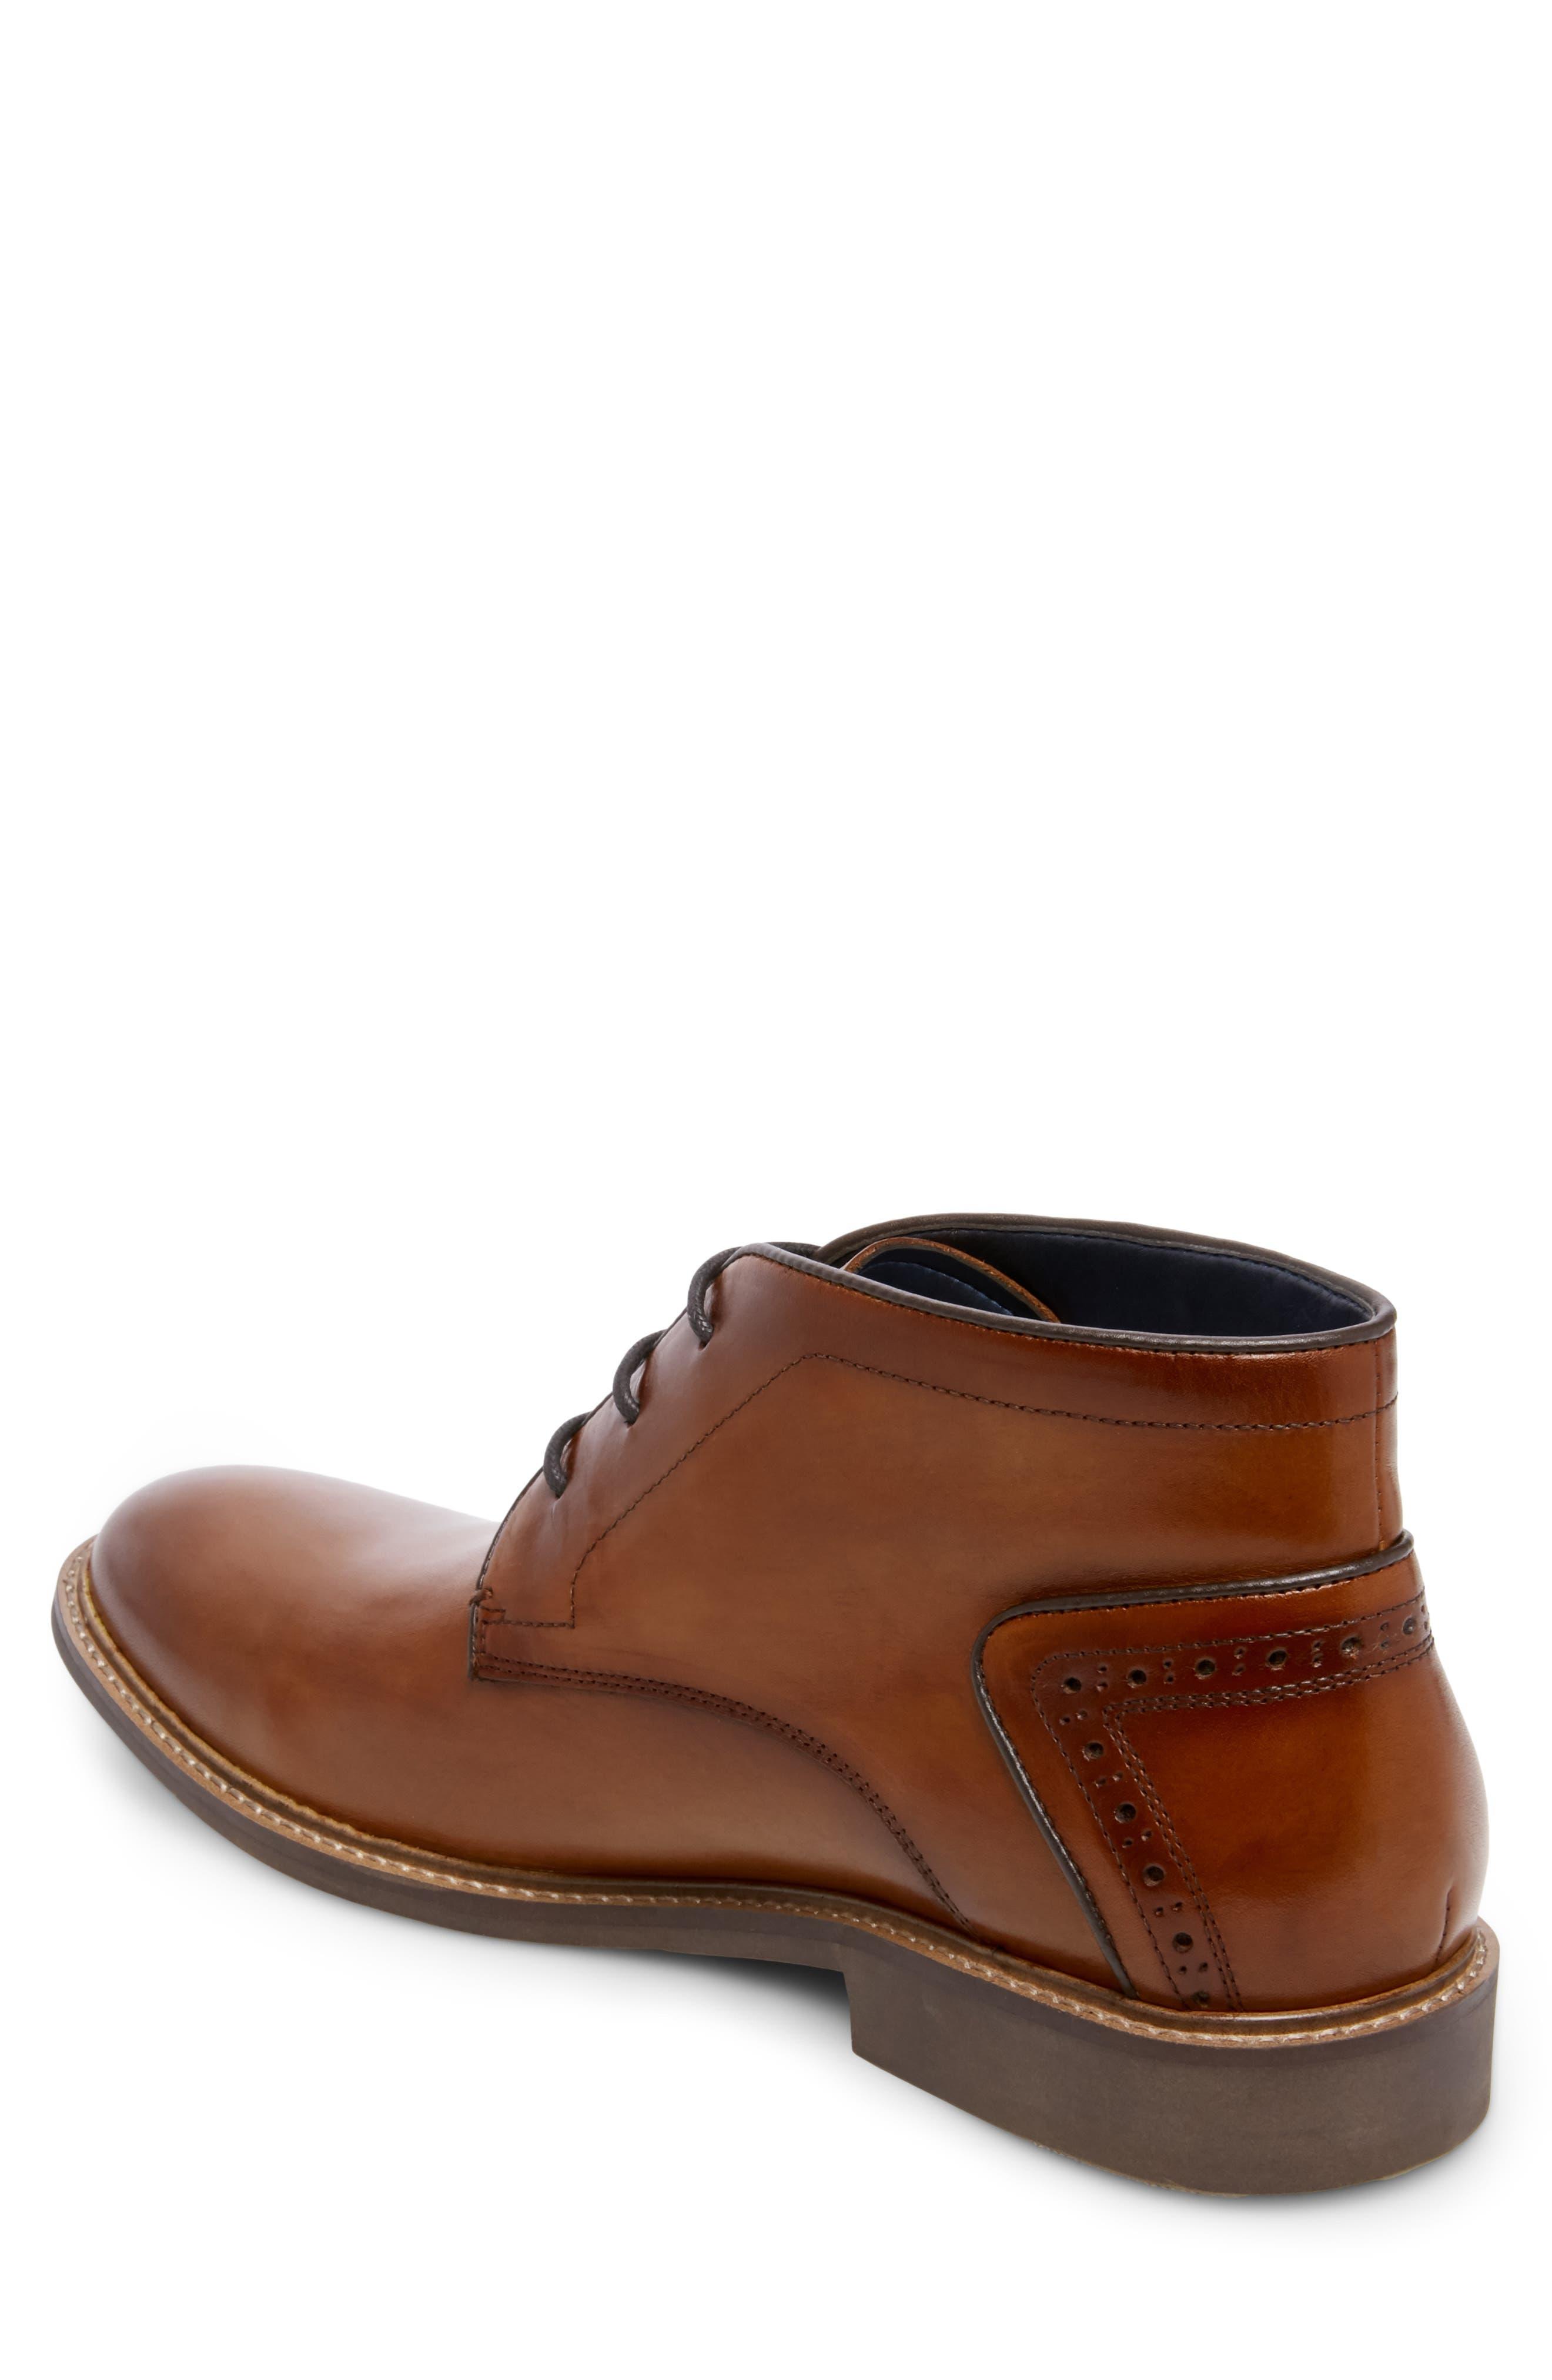 Backster Plain Toe Chukka Boot,                             Alternate thumbnail 2, color,                             COGNAC LEATHER